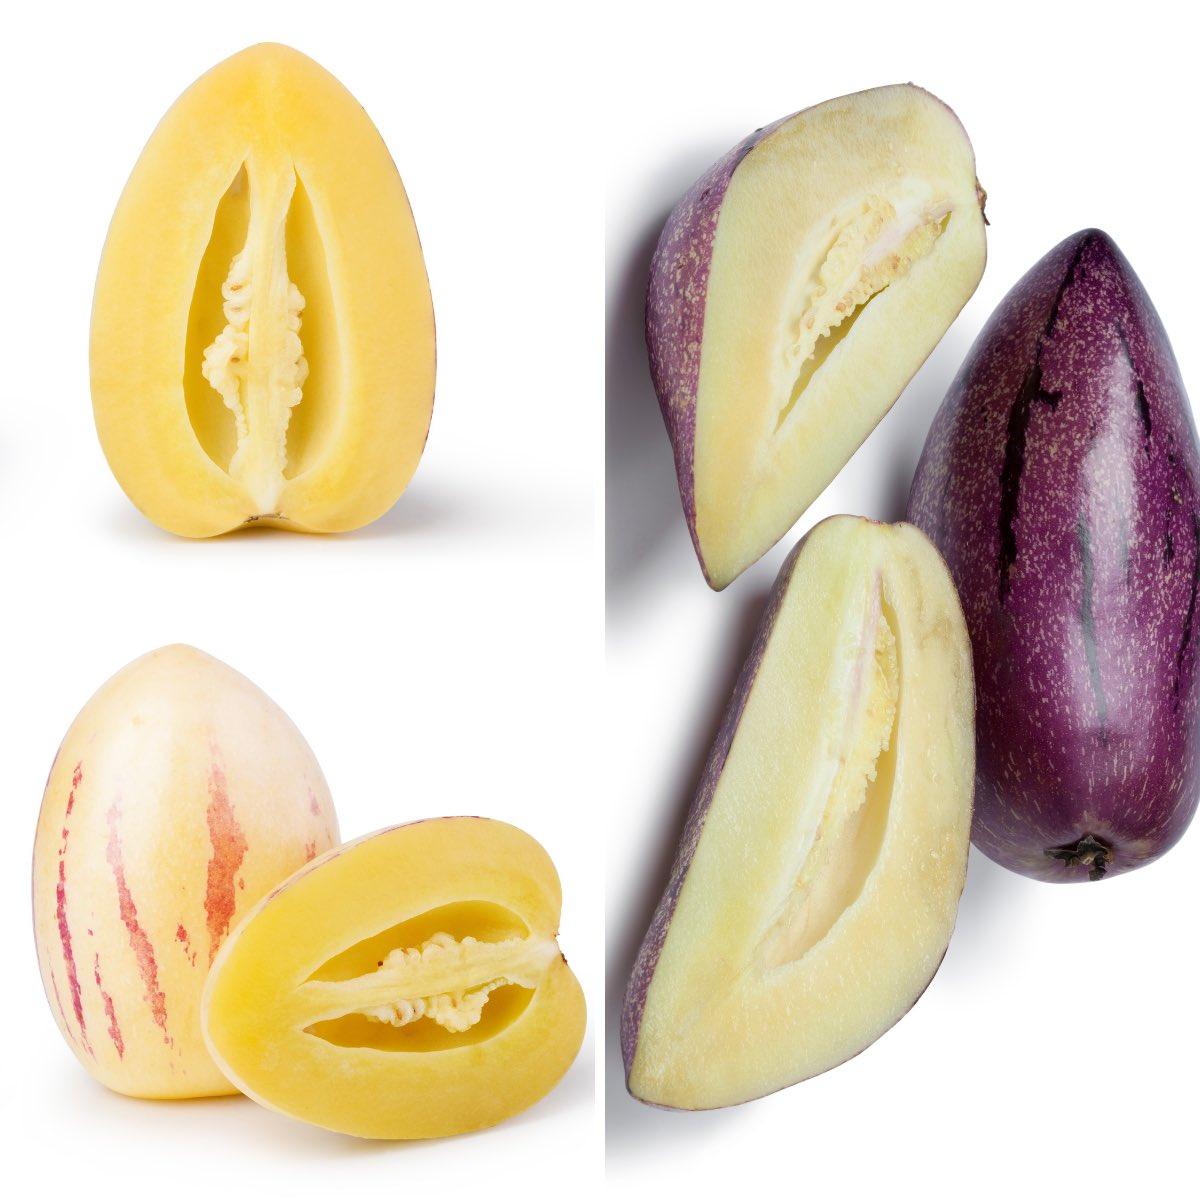 Varieties of pepino melon including orange flesh or purple skin